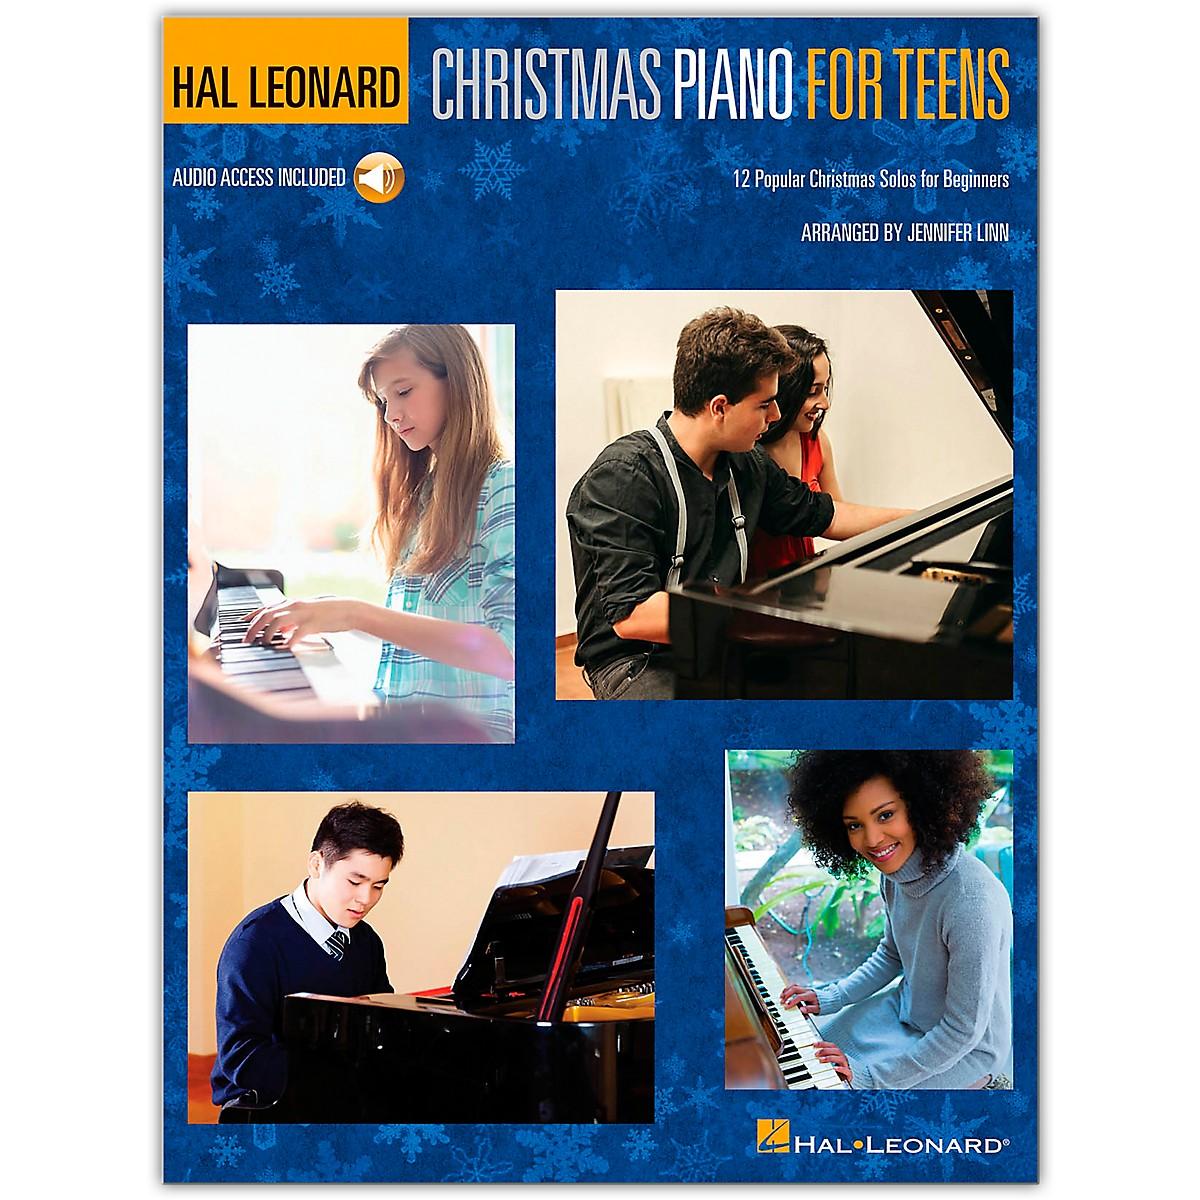 Hal Leonard Hal Leonard Christmas Piano for Teens Piano Method Book/Audio Online